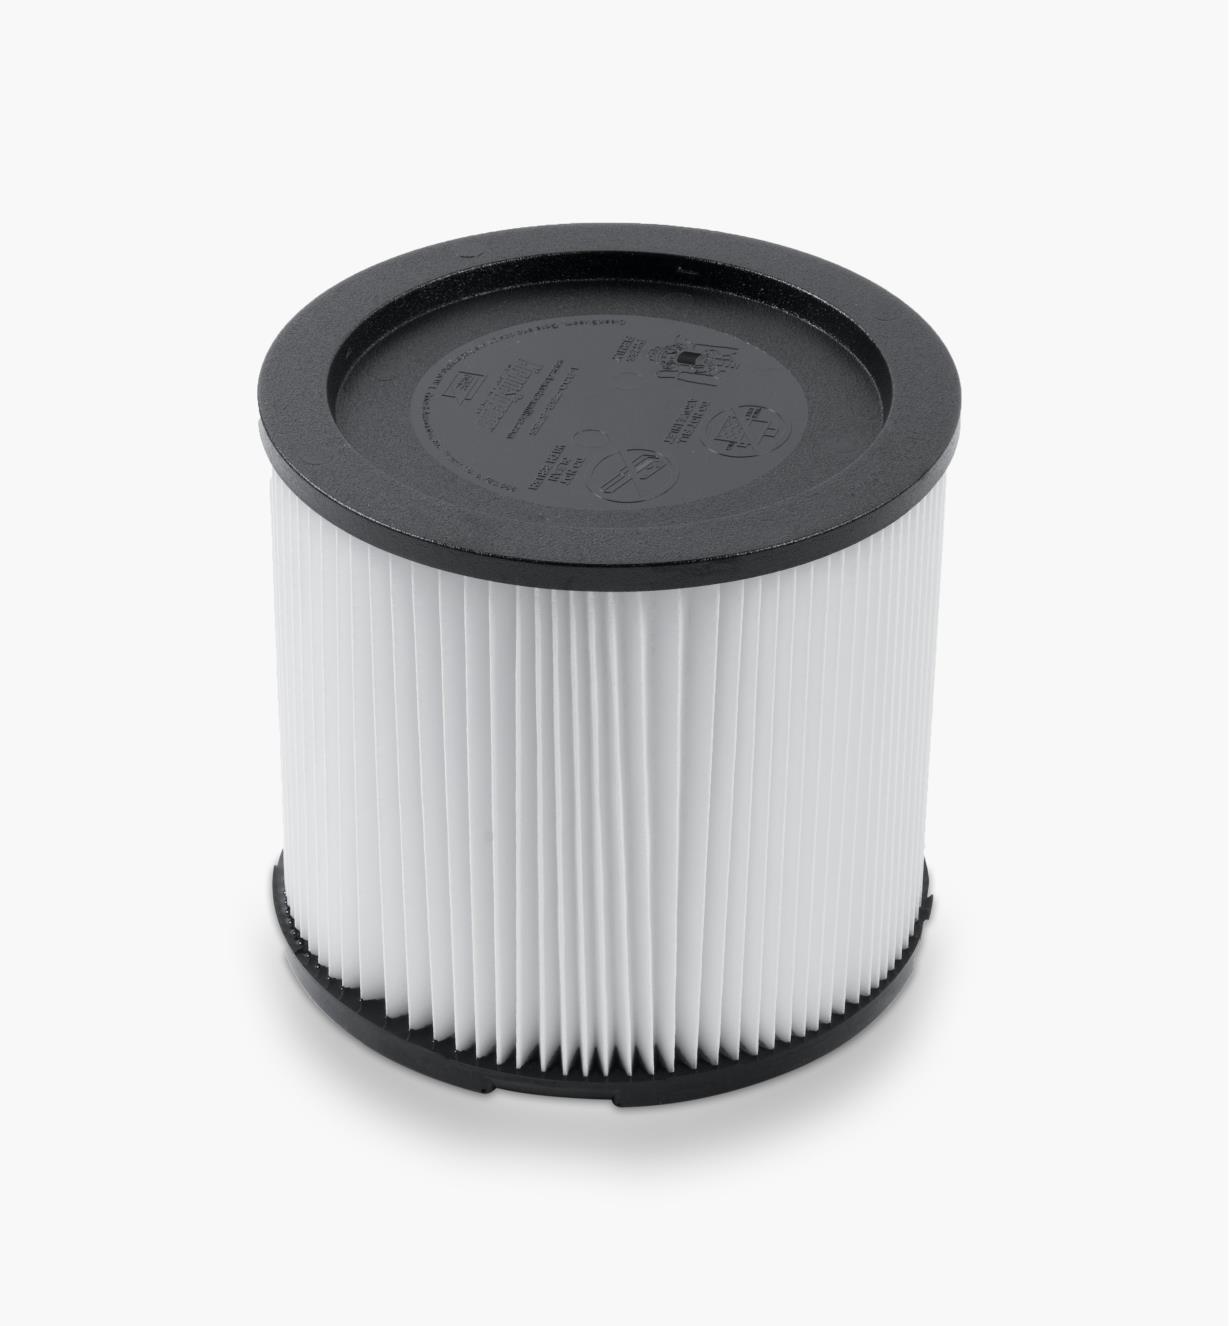 03J2419 - Shop-Vac/Genie HEPA Filter